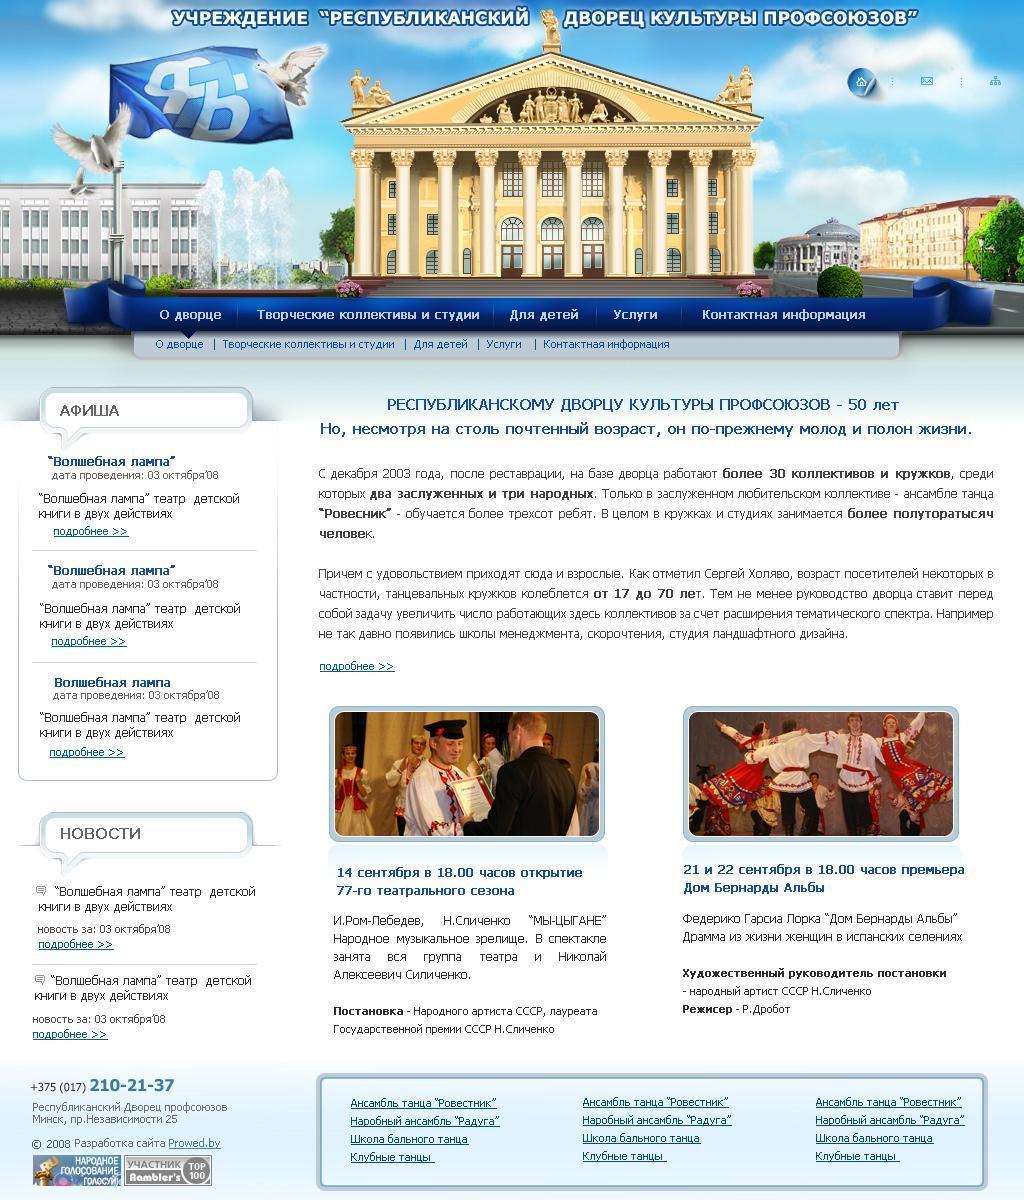 Cайт-визитка дворца культуры профсоюзов